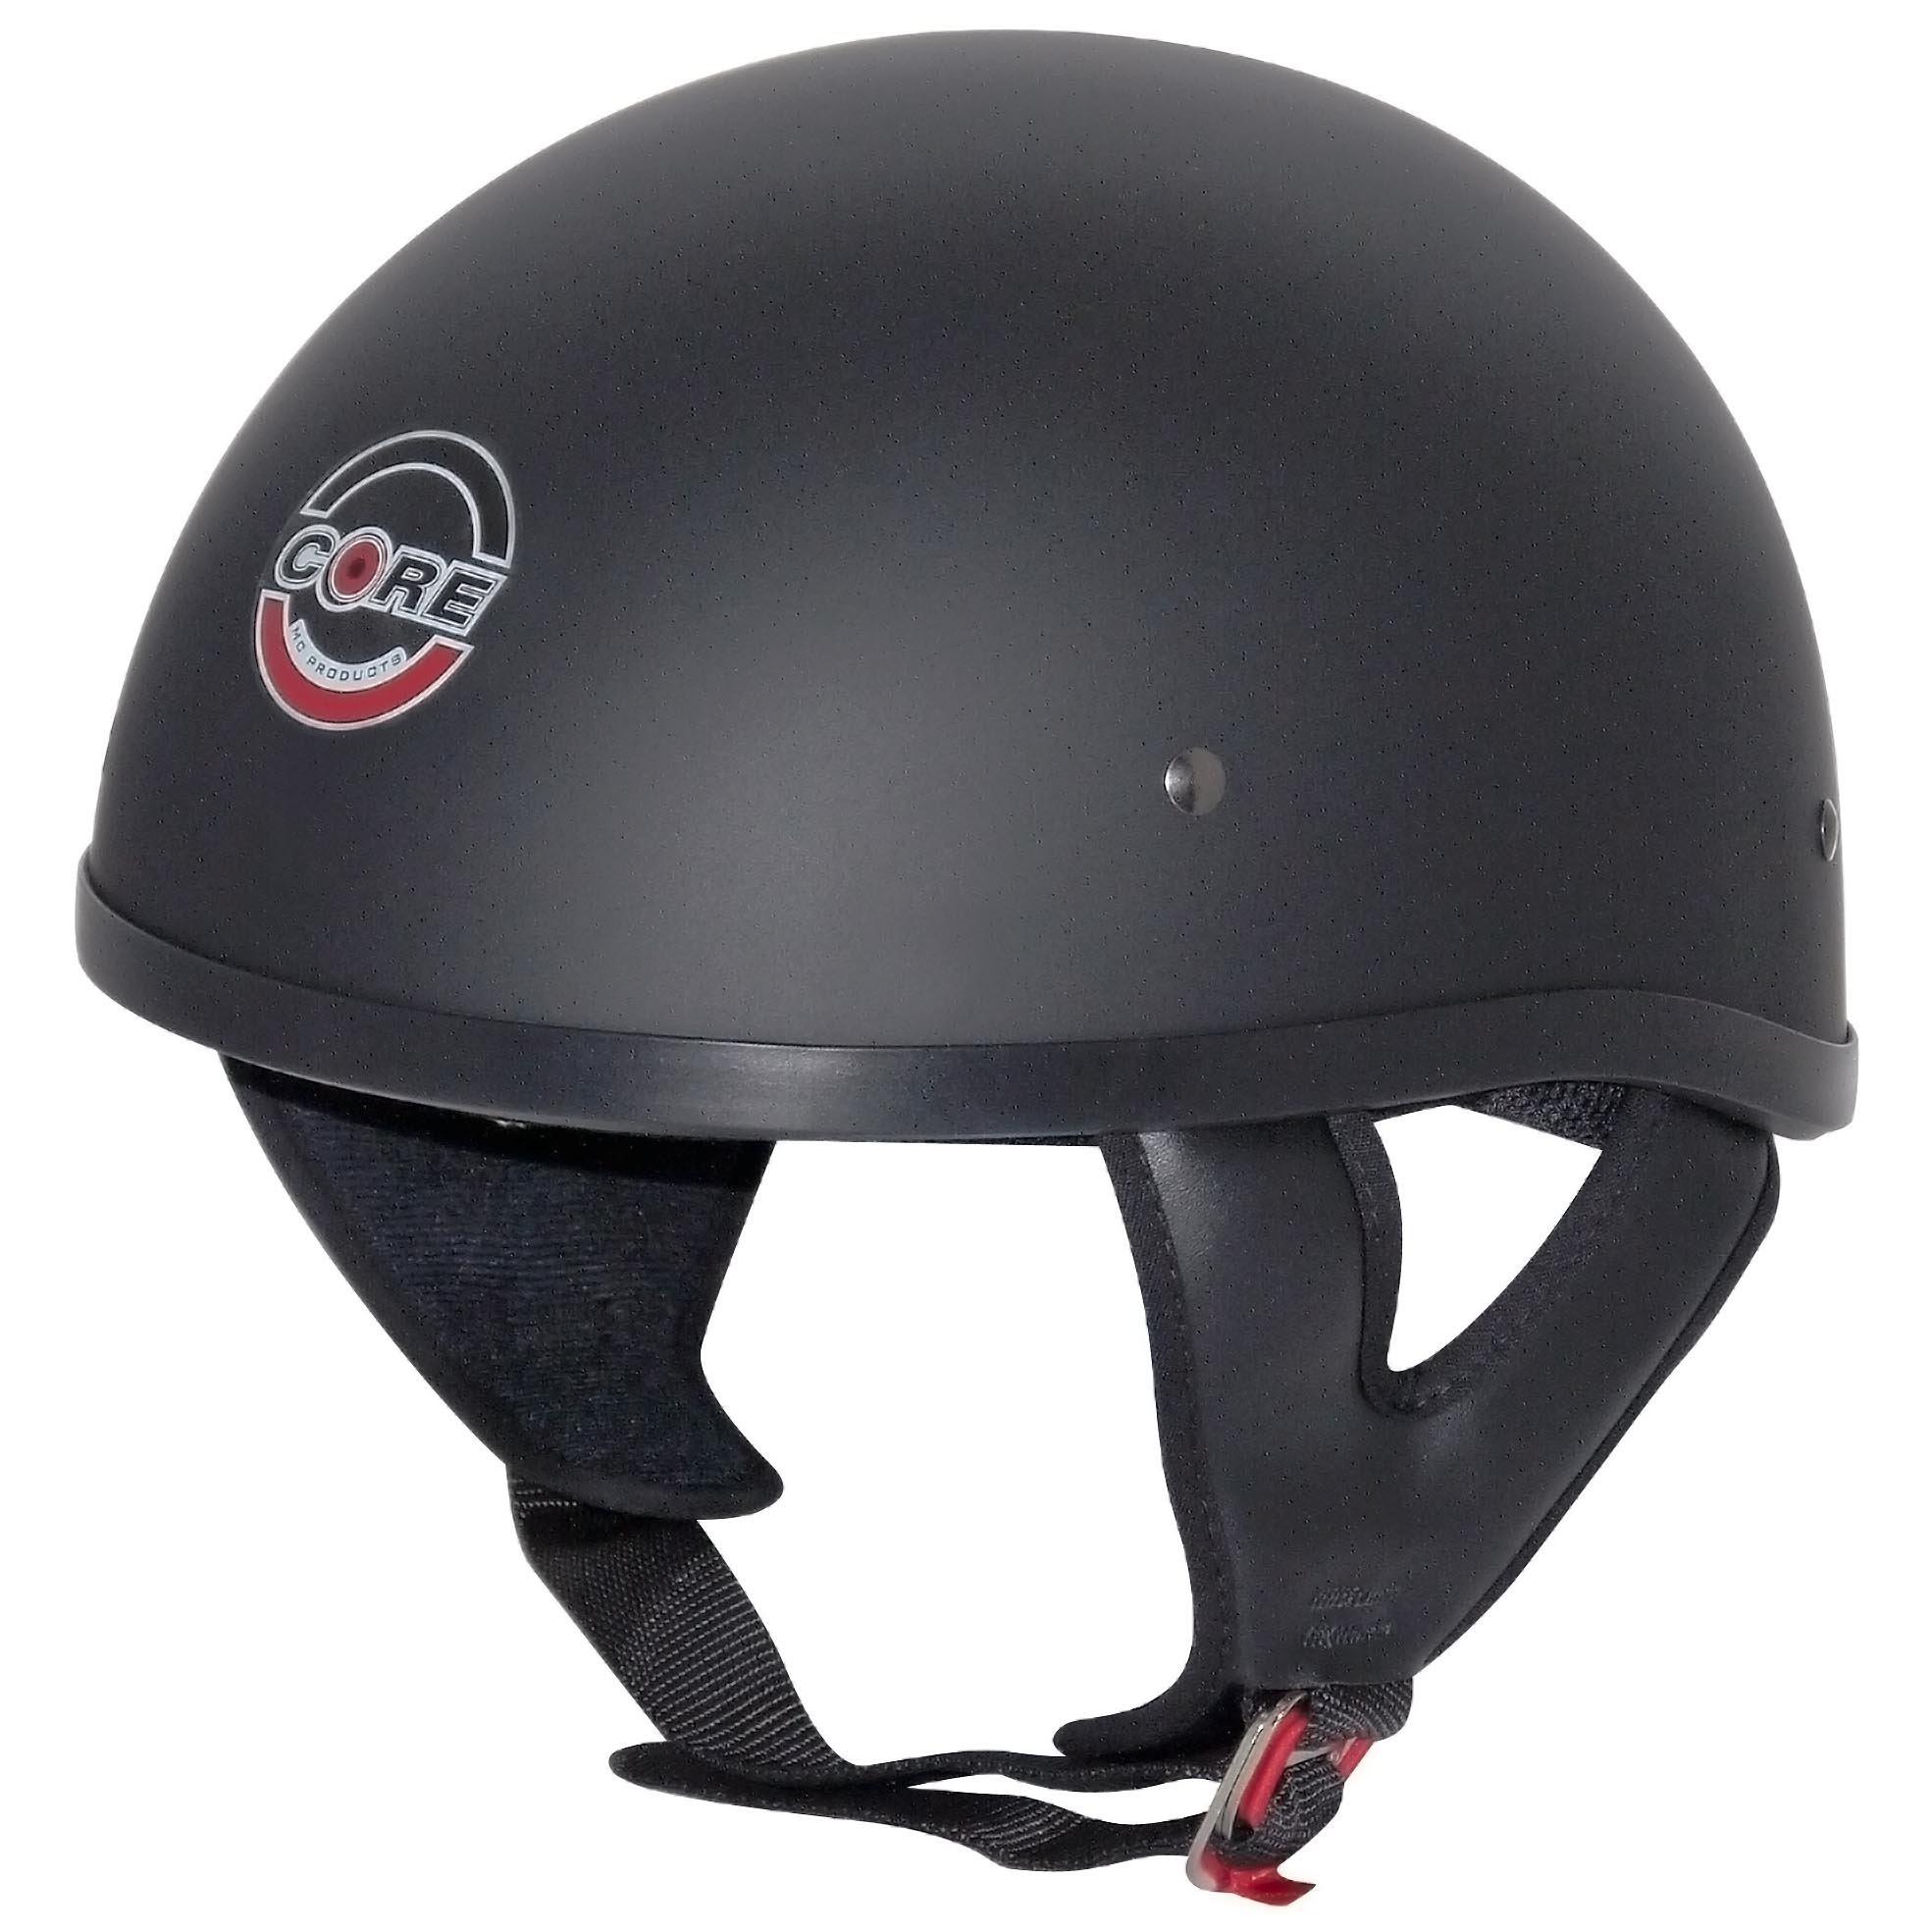 Core Cruiser-X Half Helmet (Flat Black, Large)